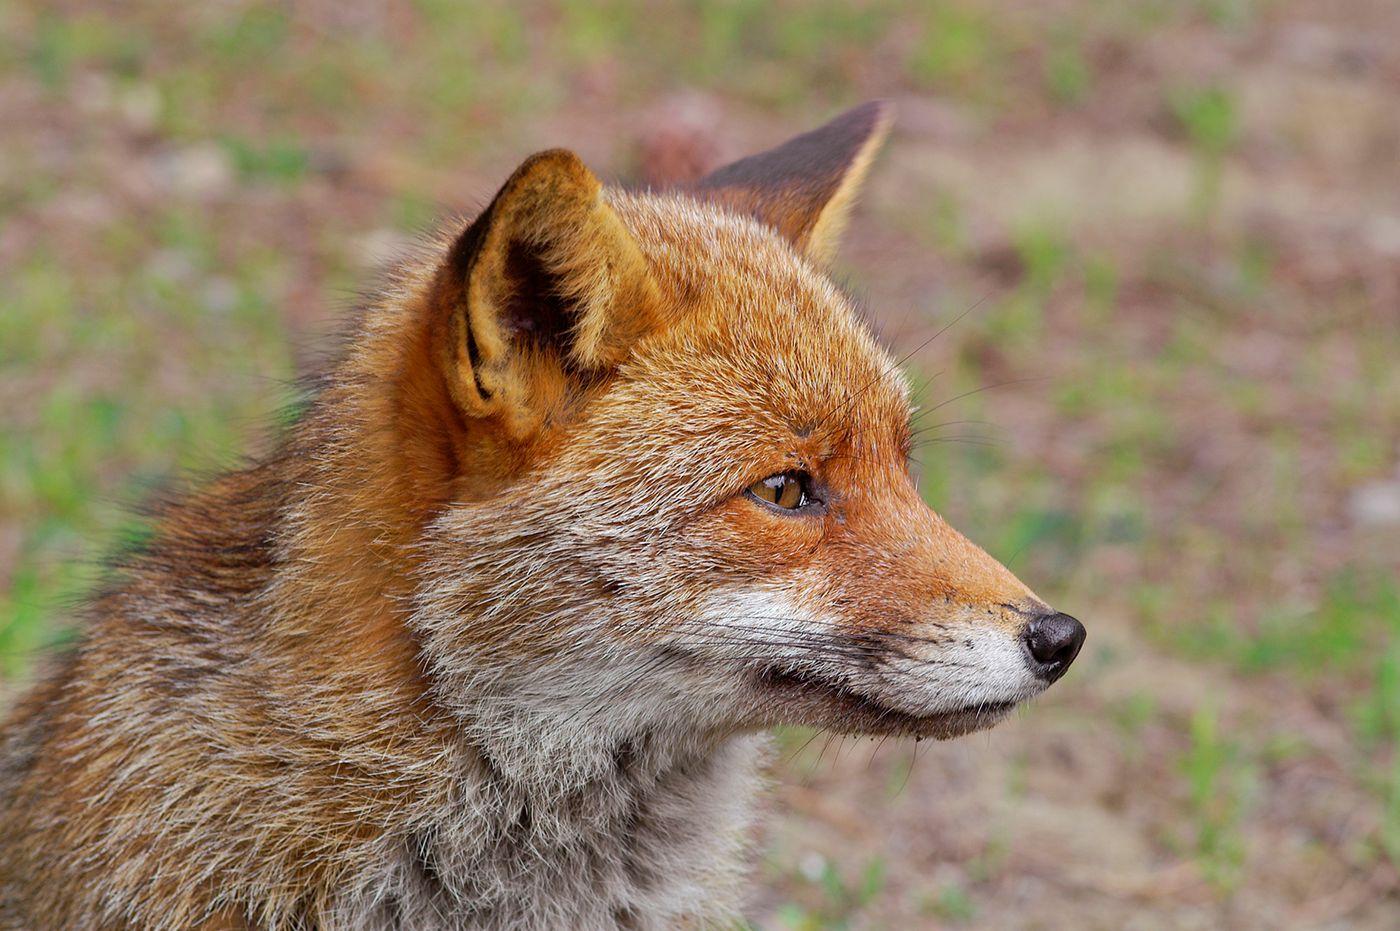 Wild animals endure illness, injury, and starvation  We